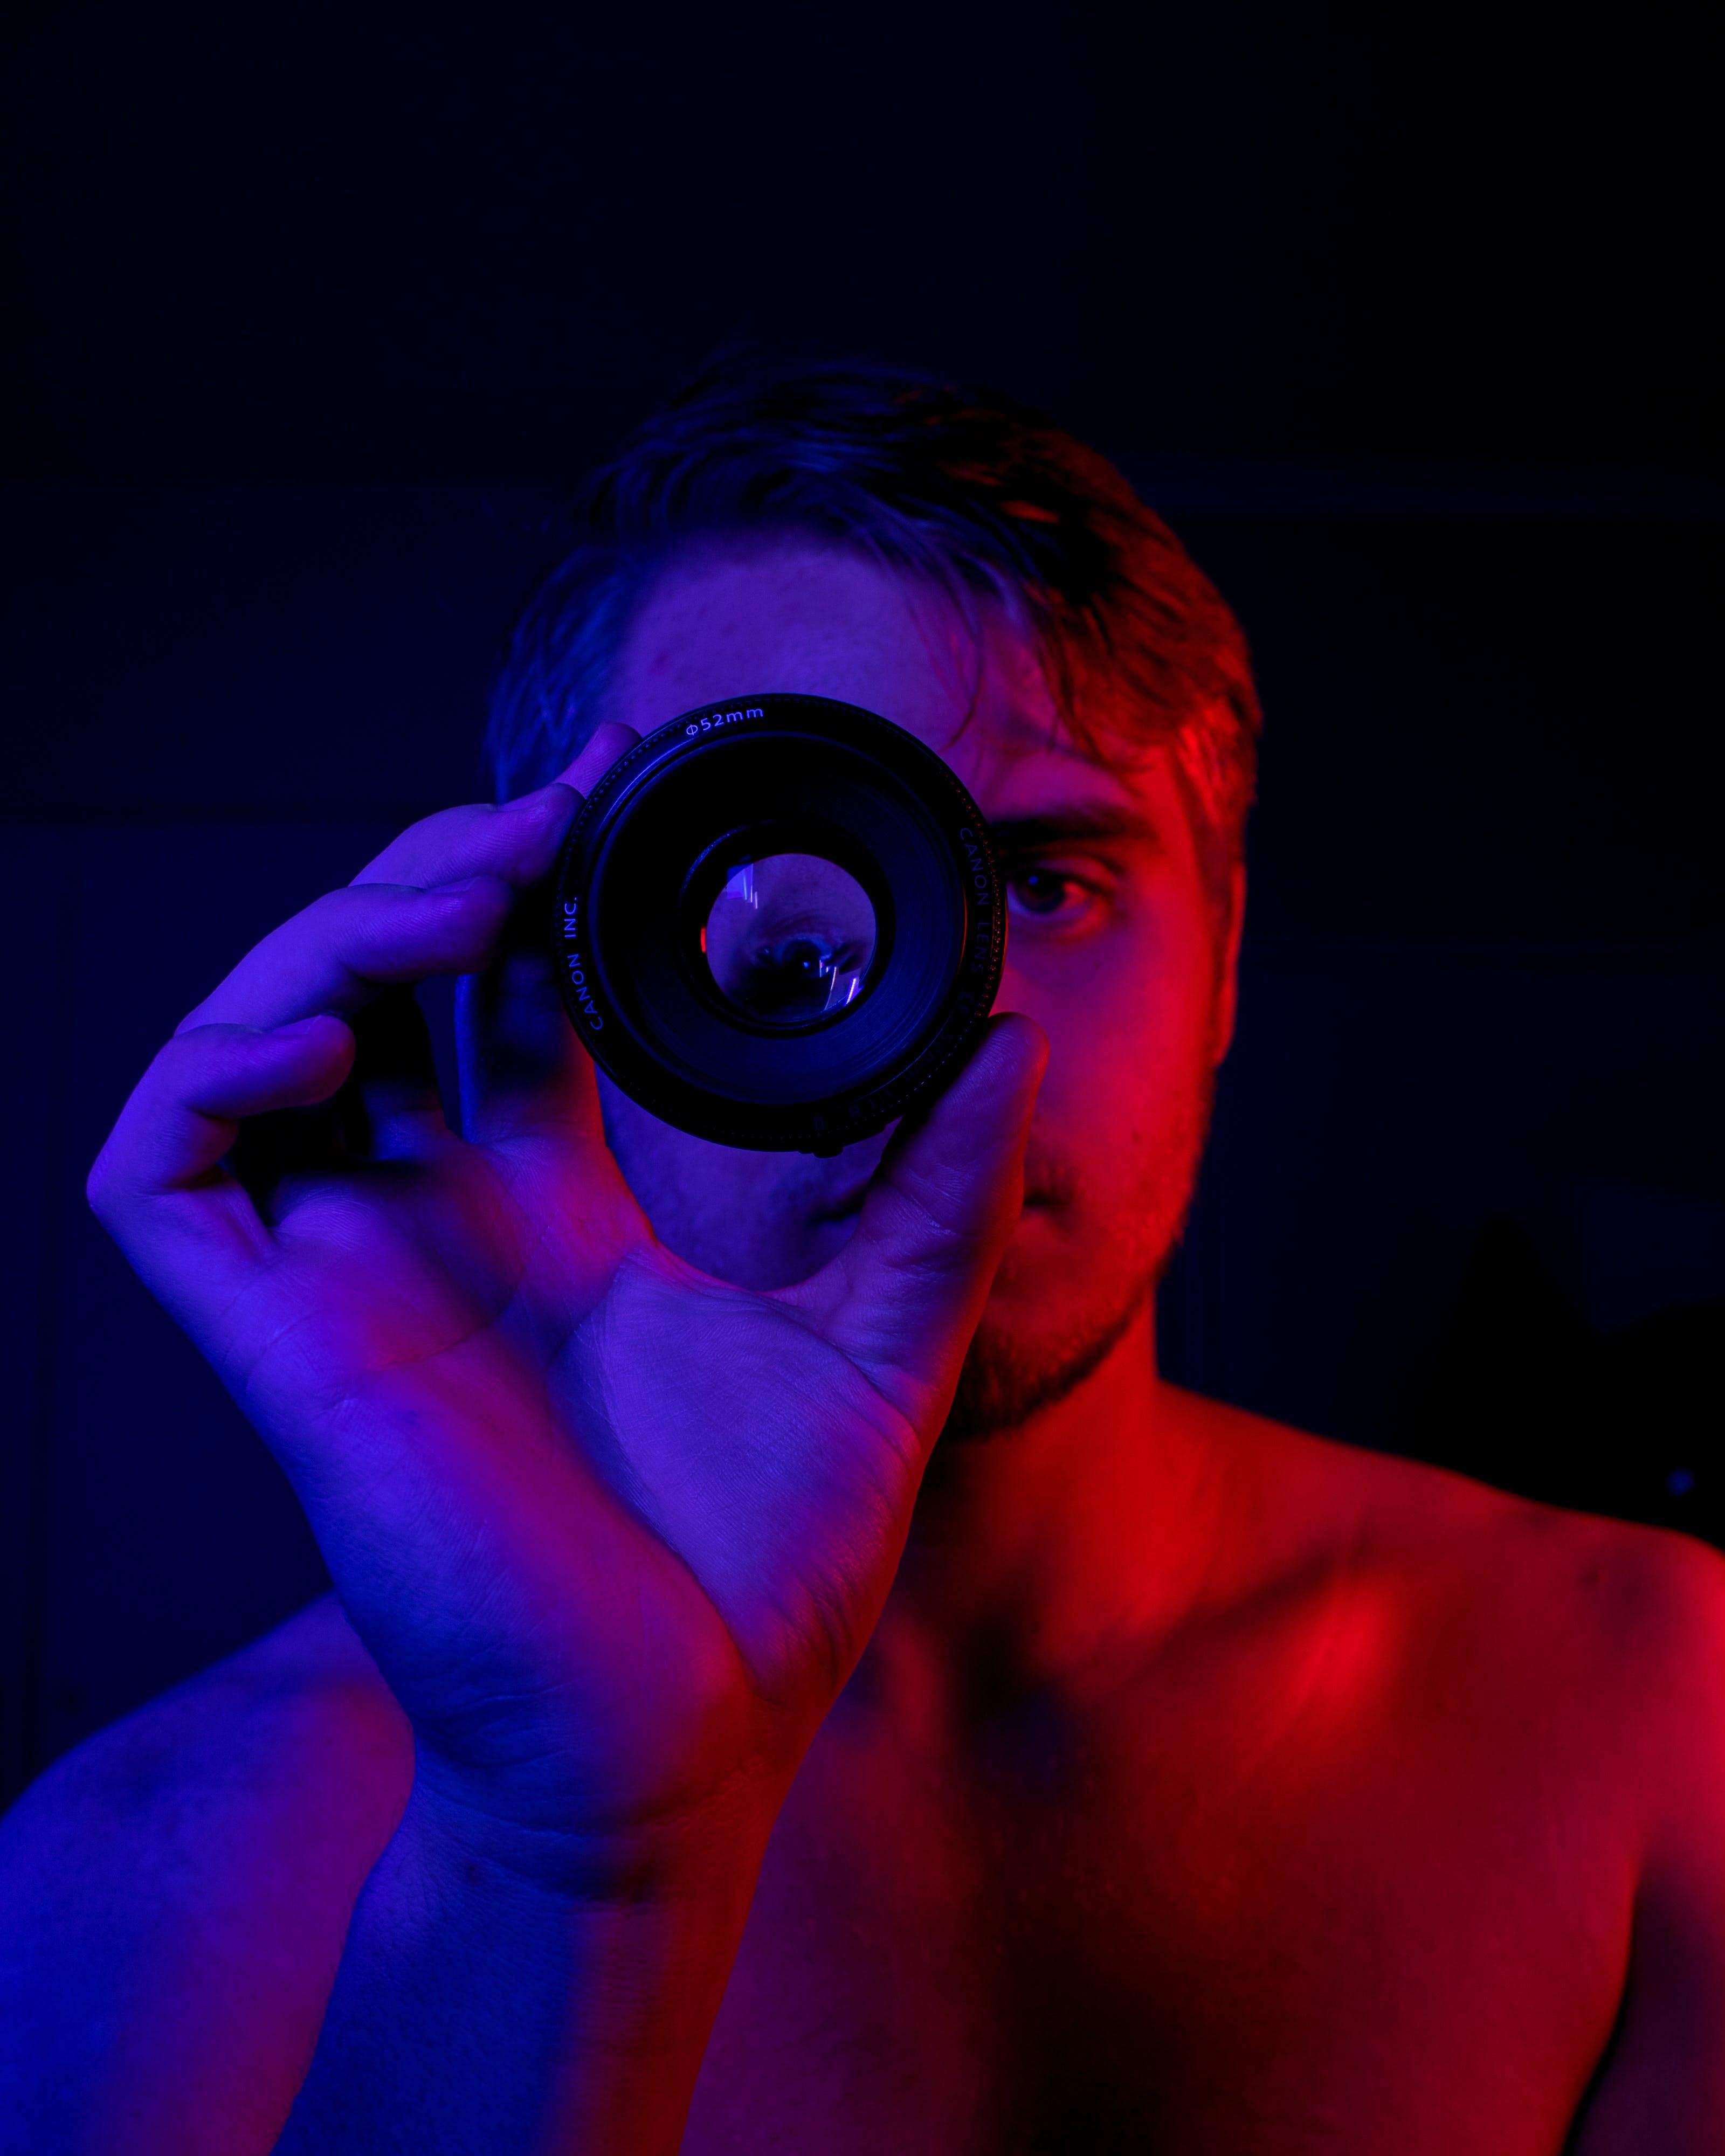 Topless Man Holding Round Black Mirror Device